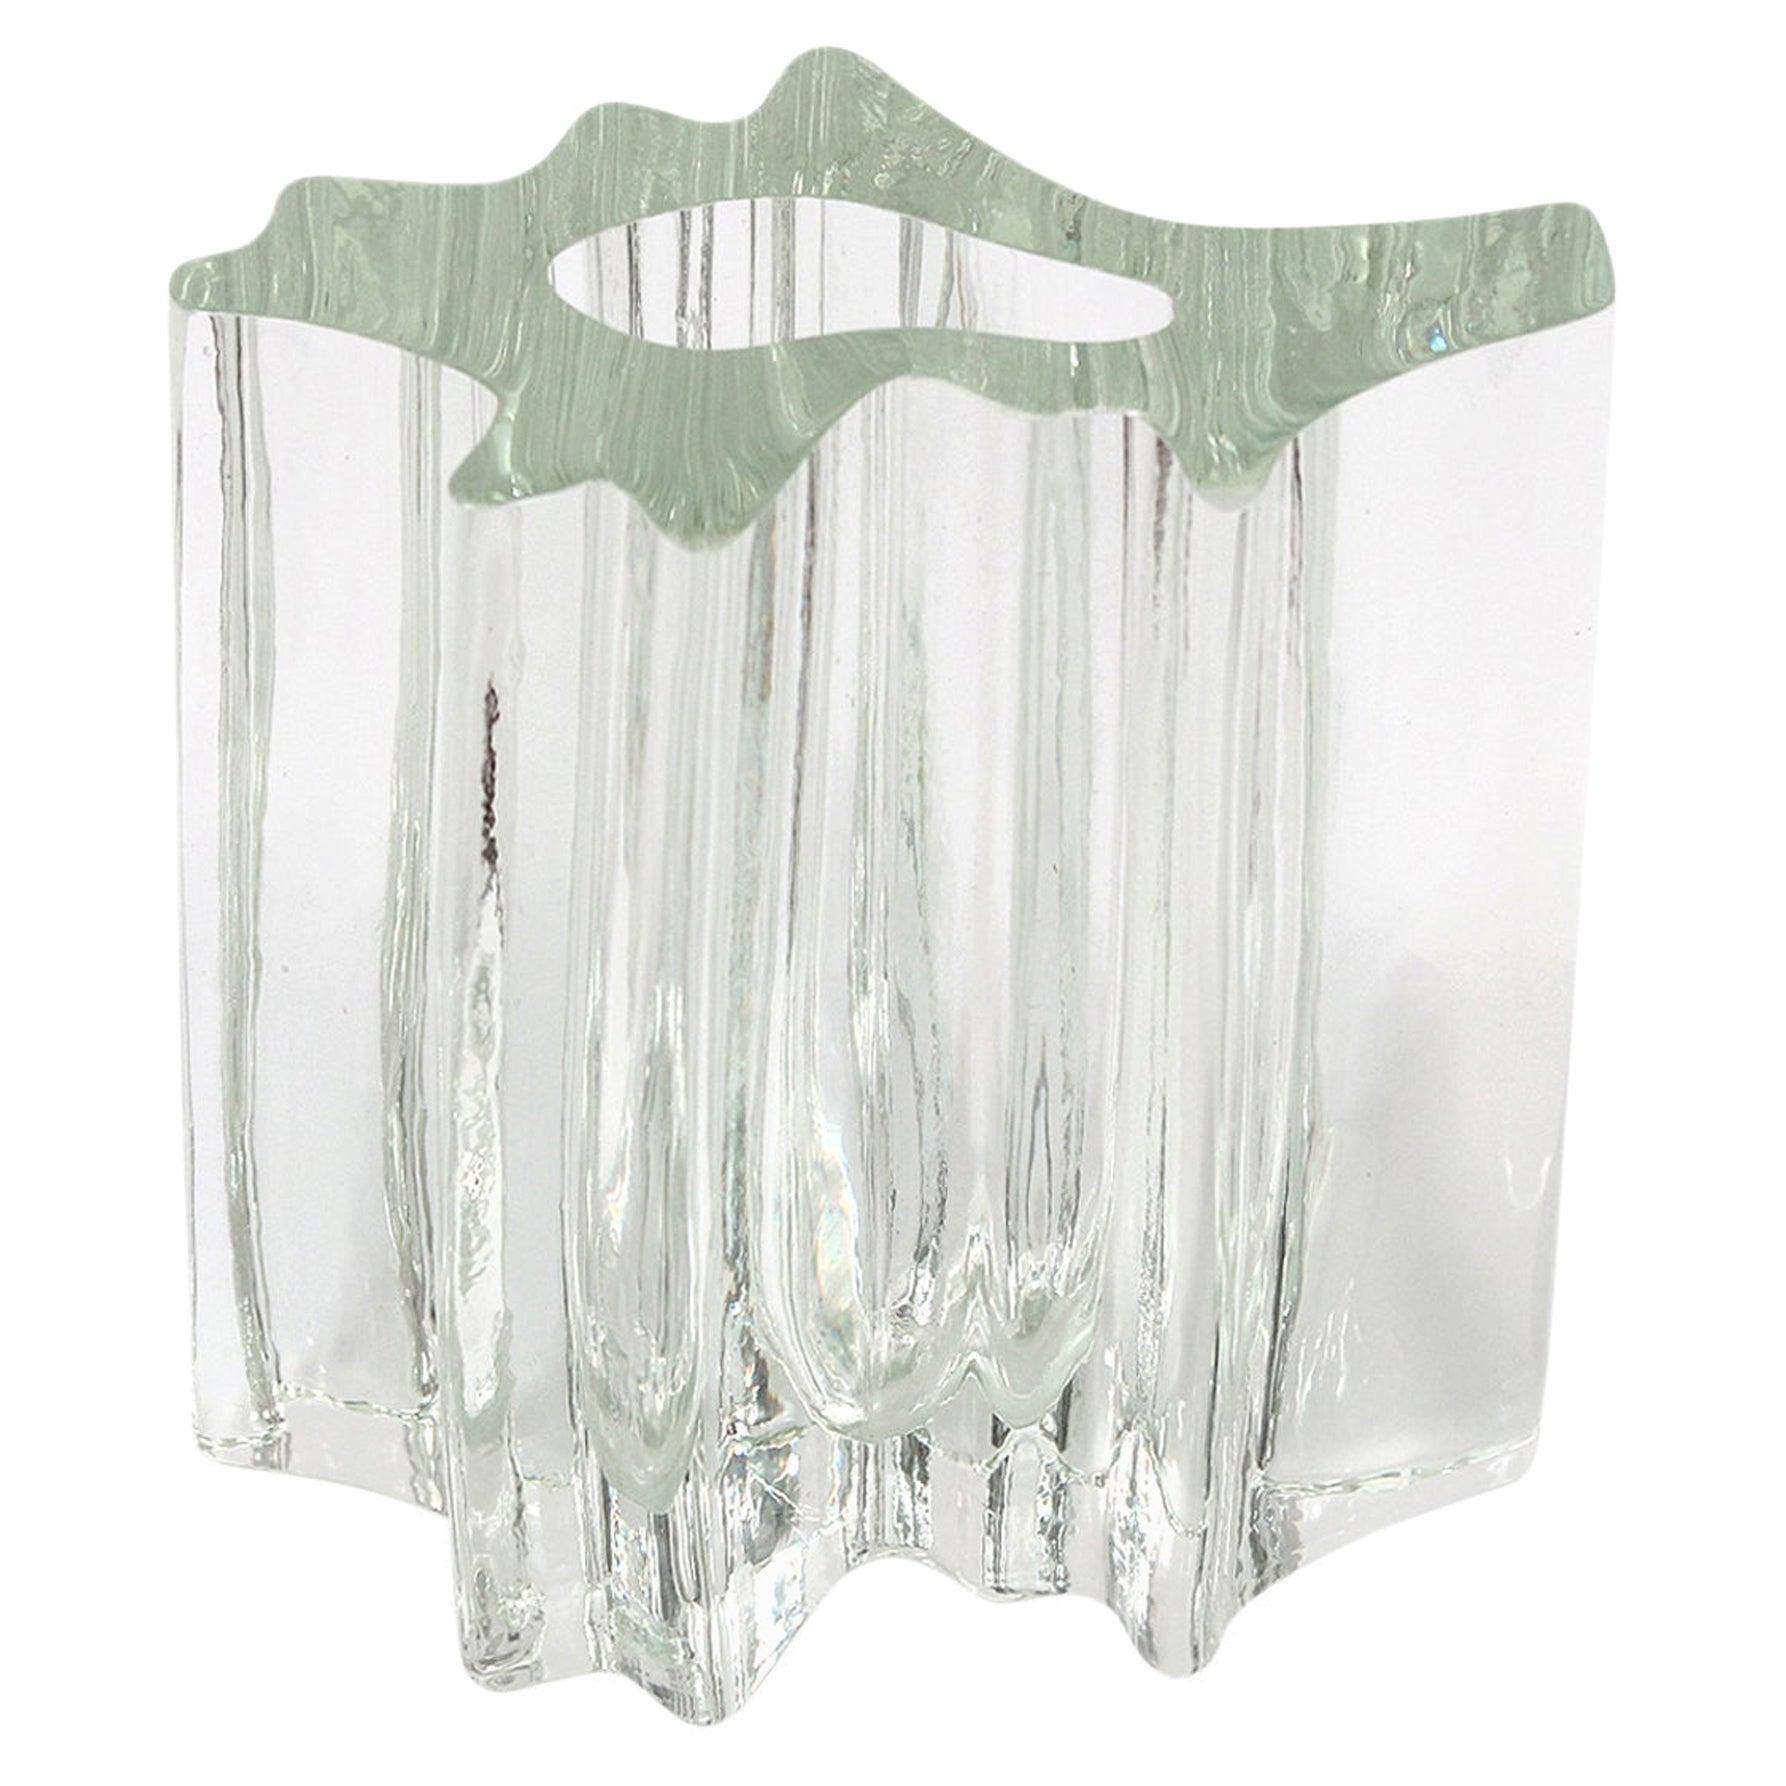 Angelo Mangiarotti Glass Vase for Vistosi